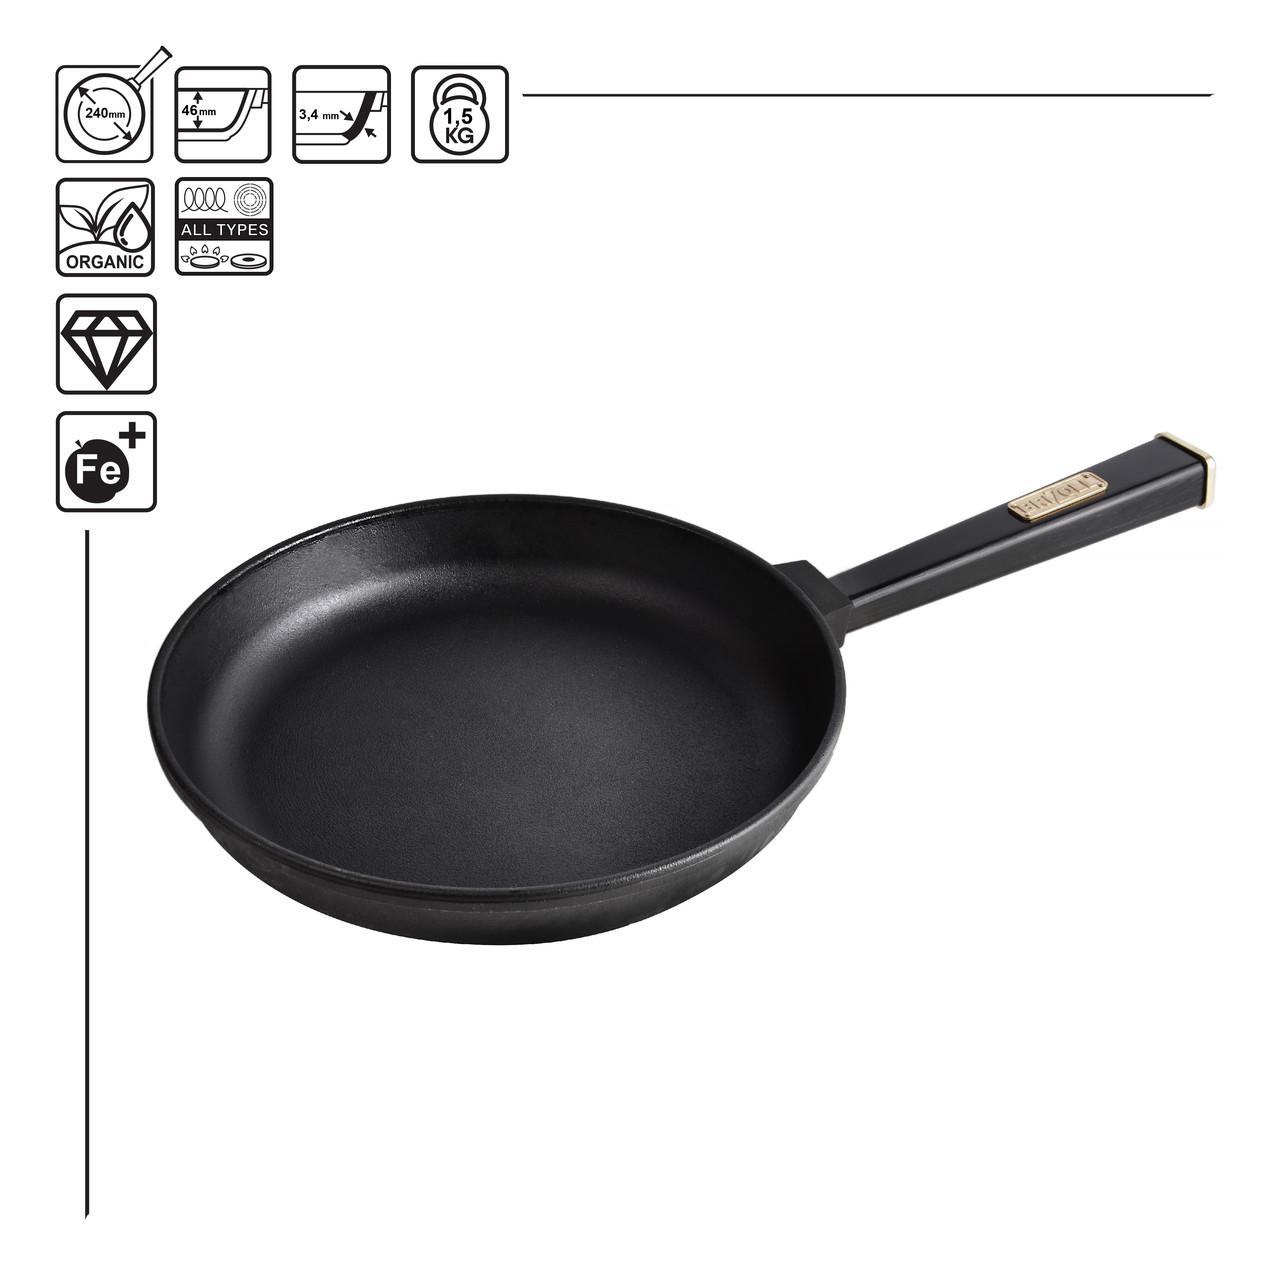 Чугунная сковорода Brizoll Бризоль с ручкой Optima-black 240х40 мм диаметр 24 см 1,93 кг O2440-P1